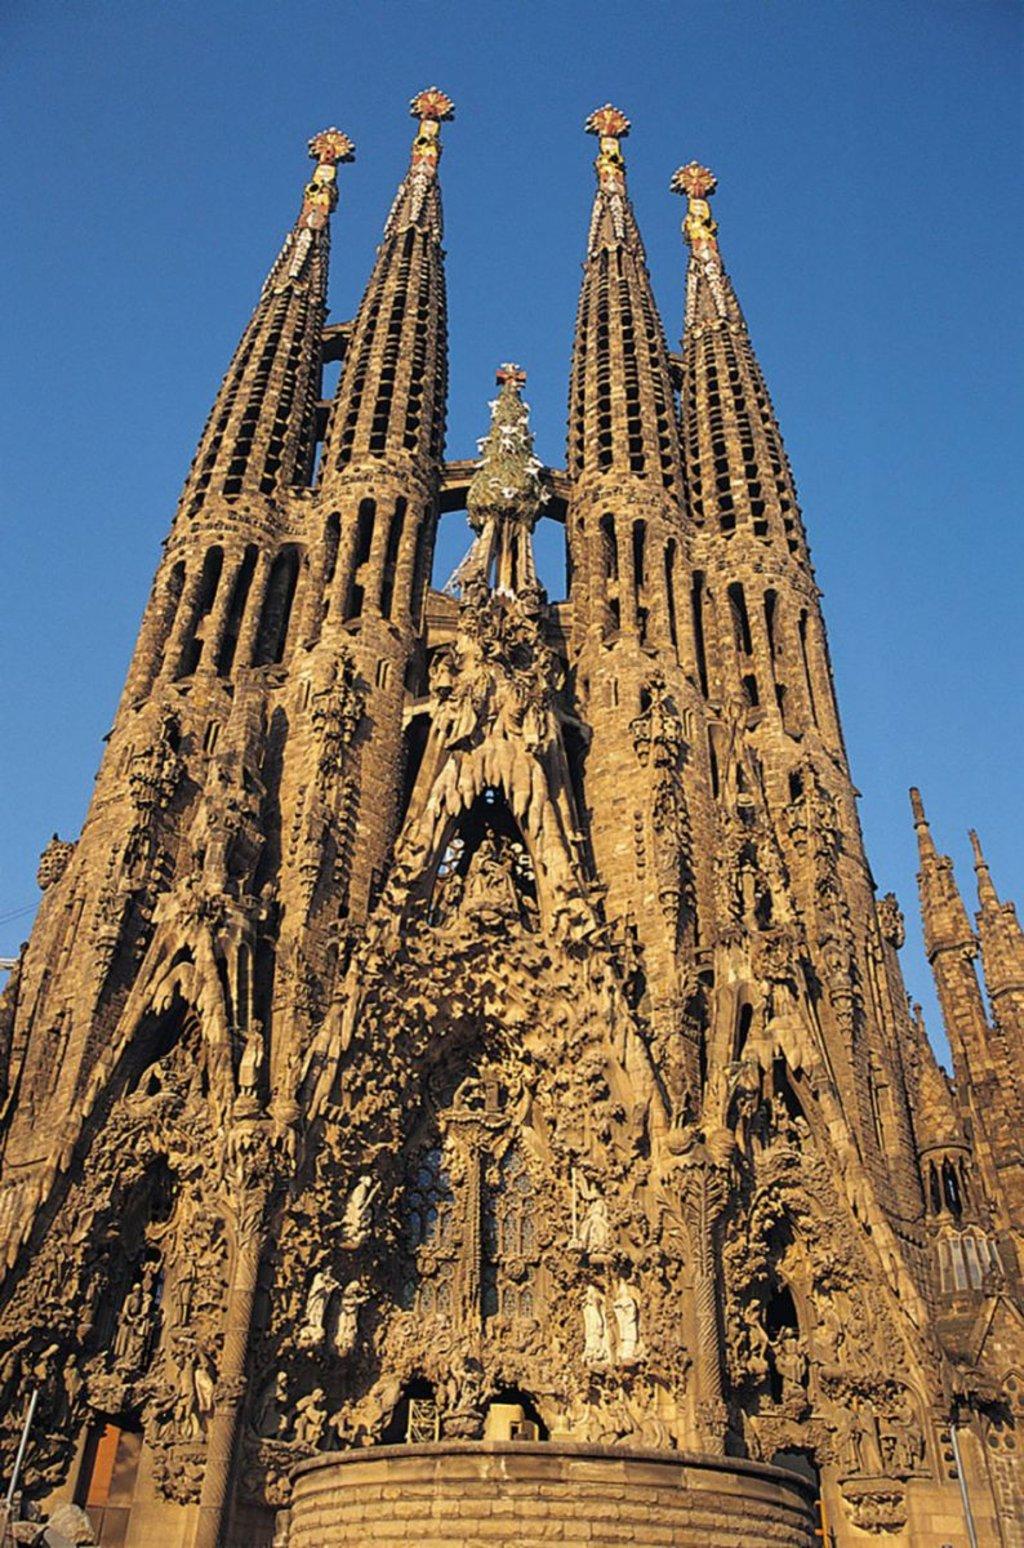 L'imponente Sagrada Familia. Photo credit Getty Images